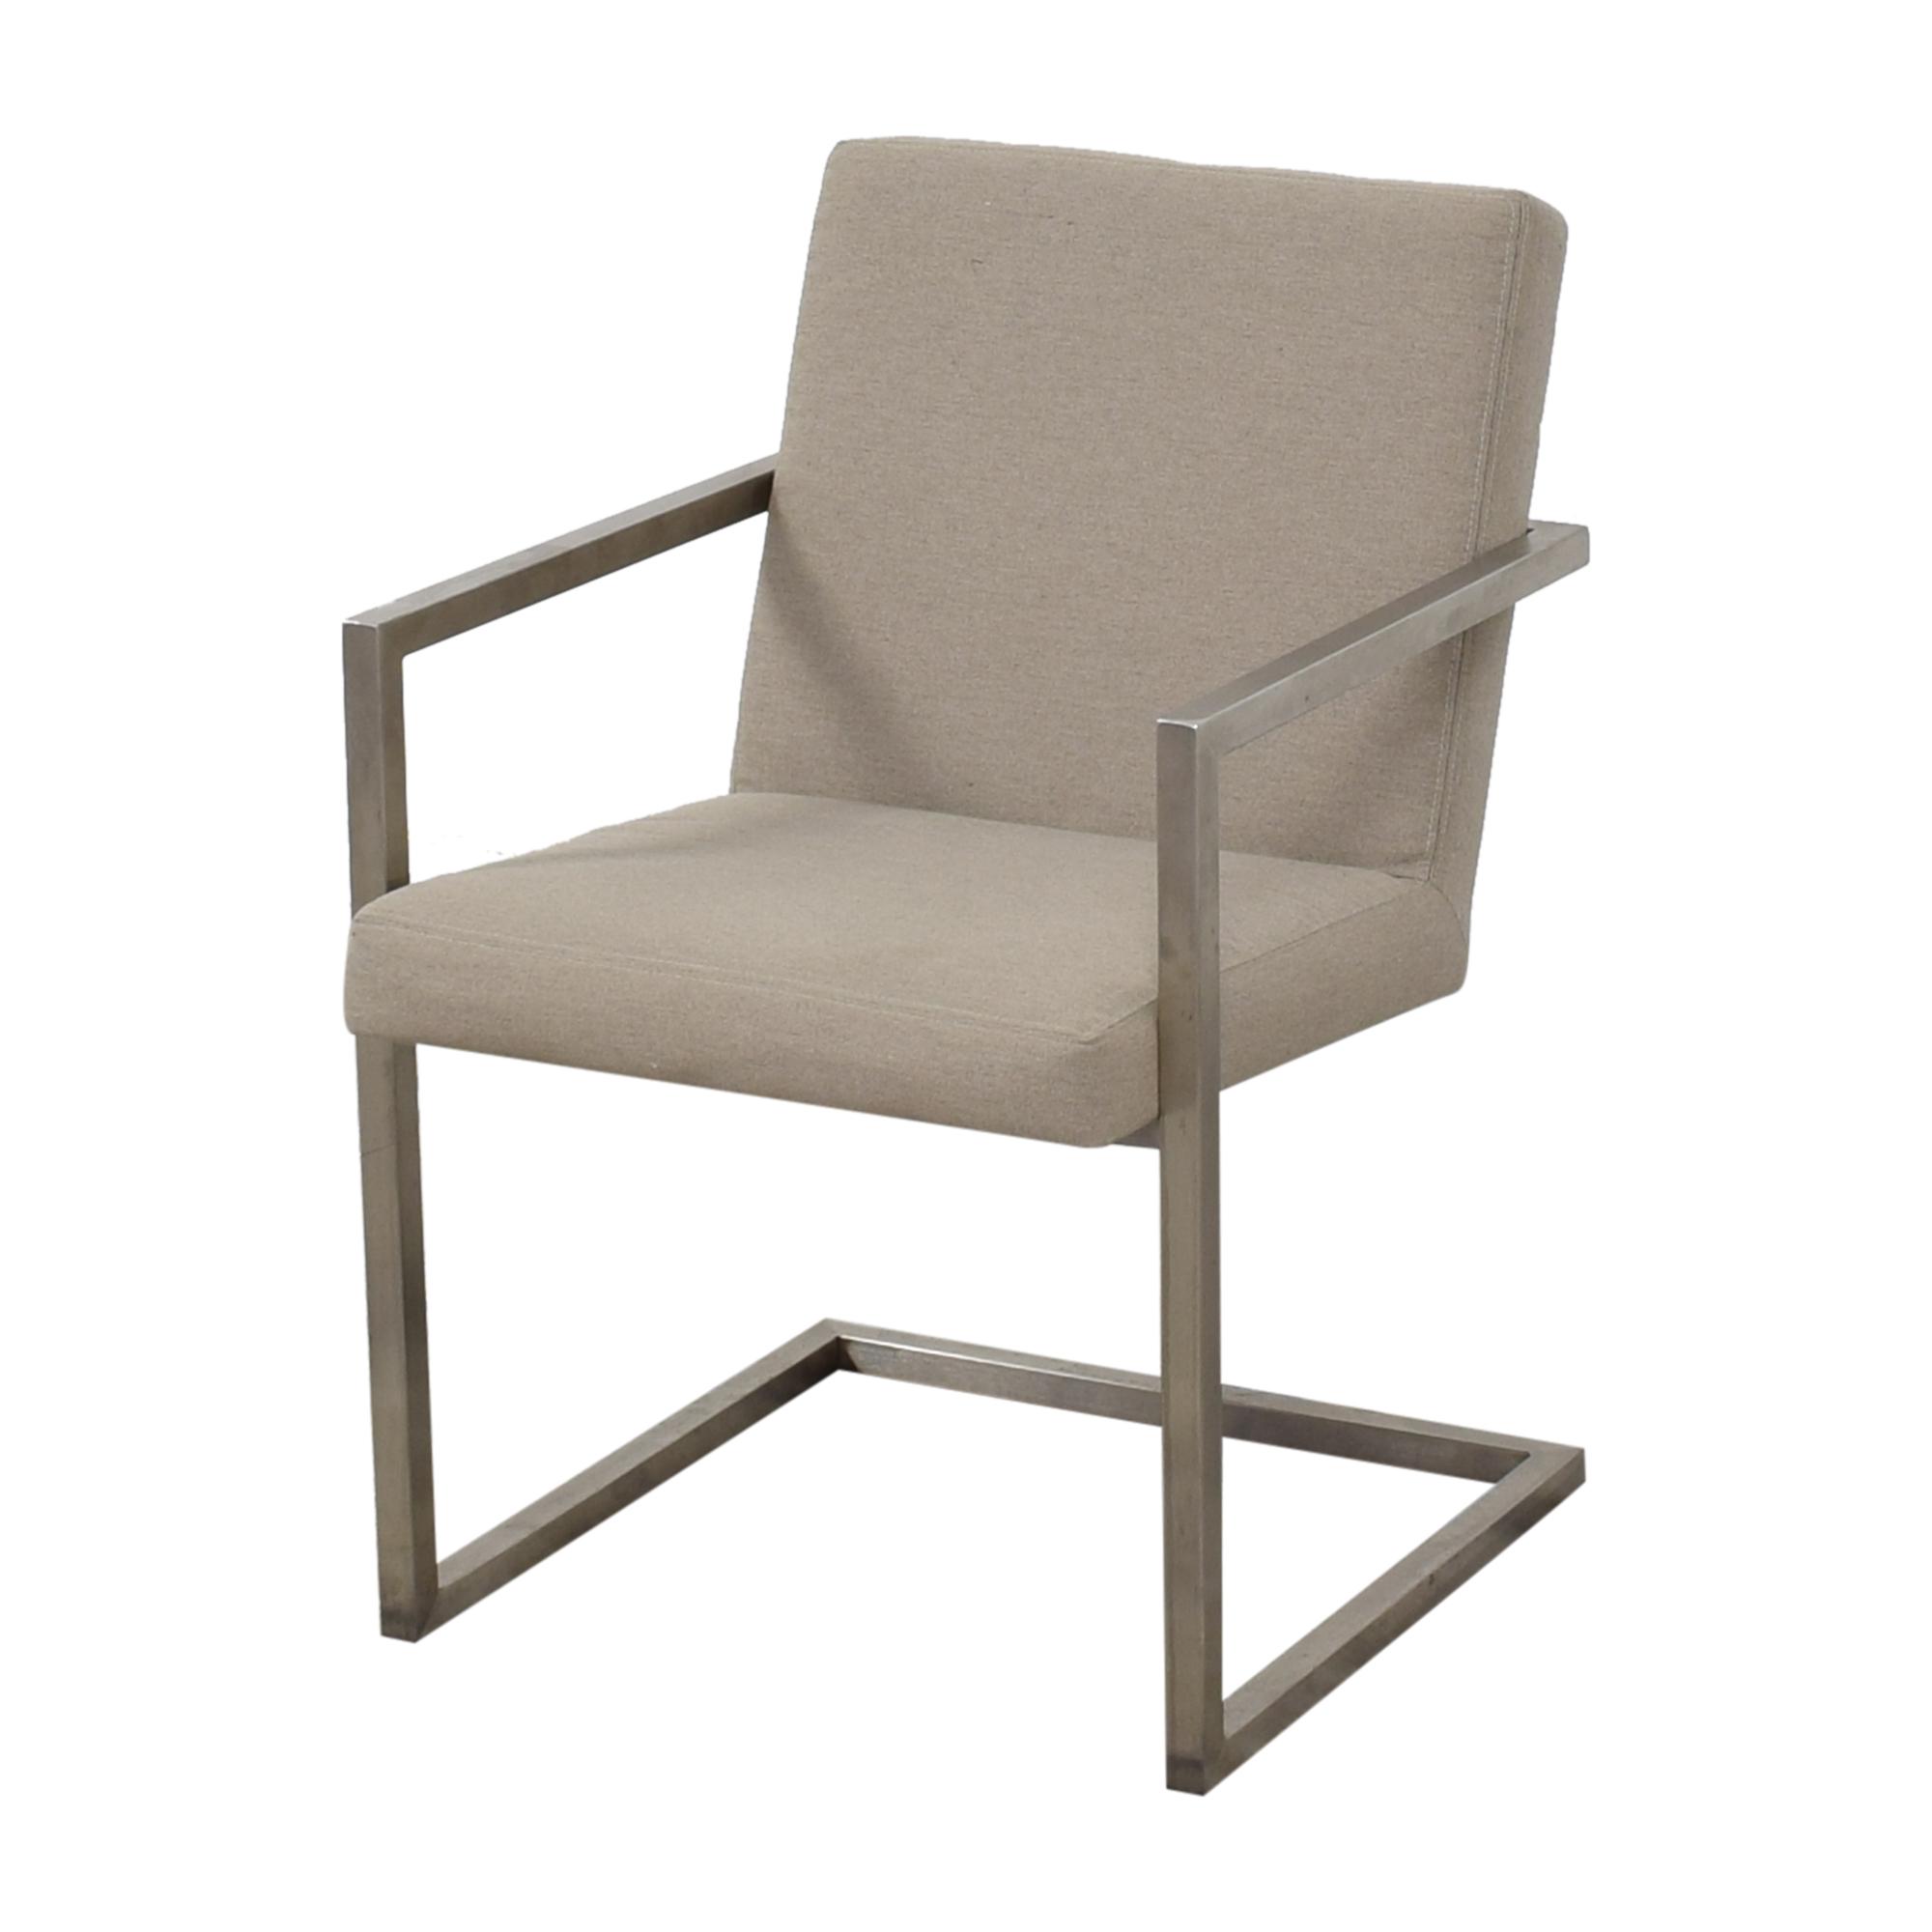 shop Room & Board Room & Board Lira Dining Arm Chair online